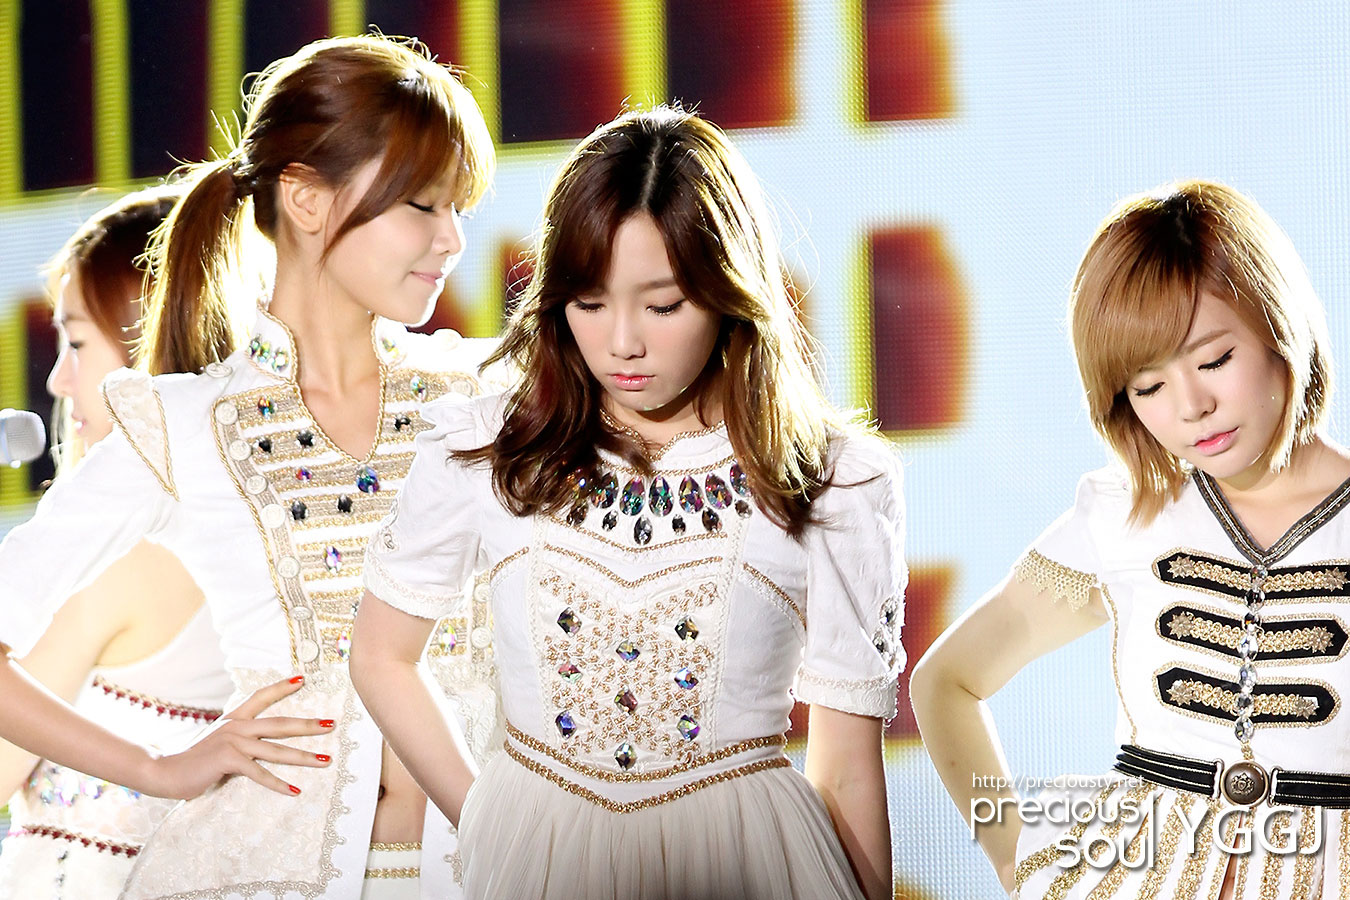 Taeyeon @ Korea-China Music Festival 2012